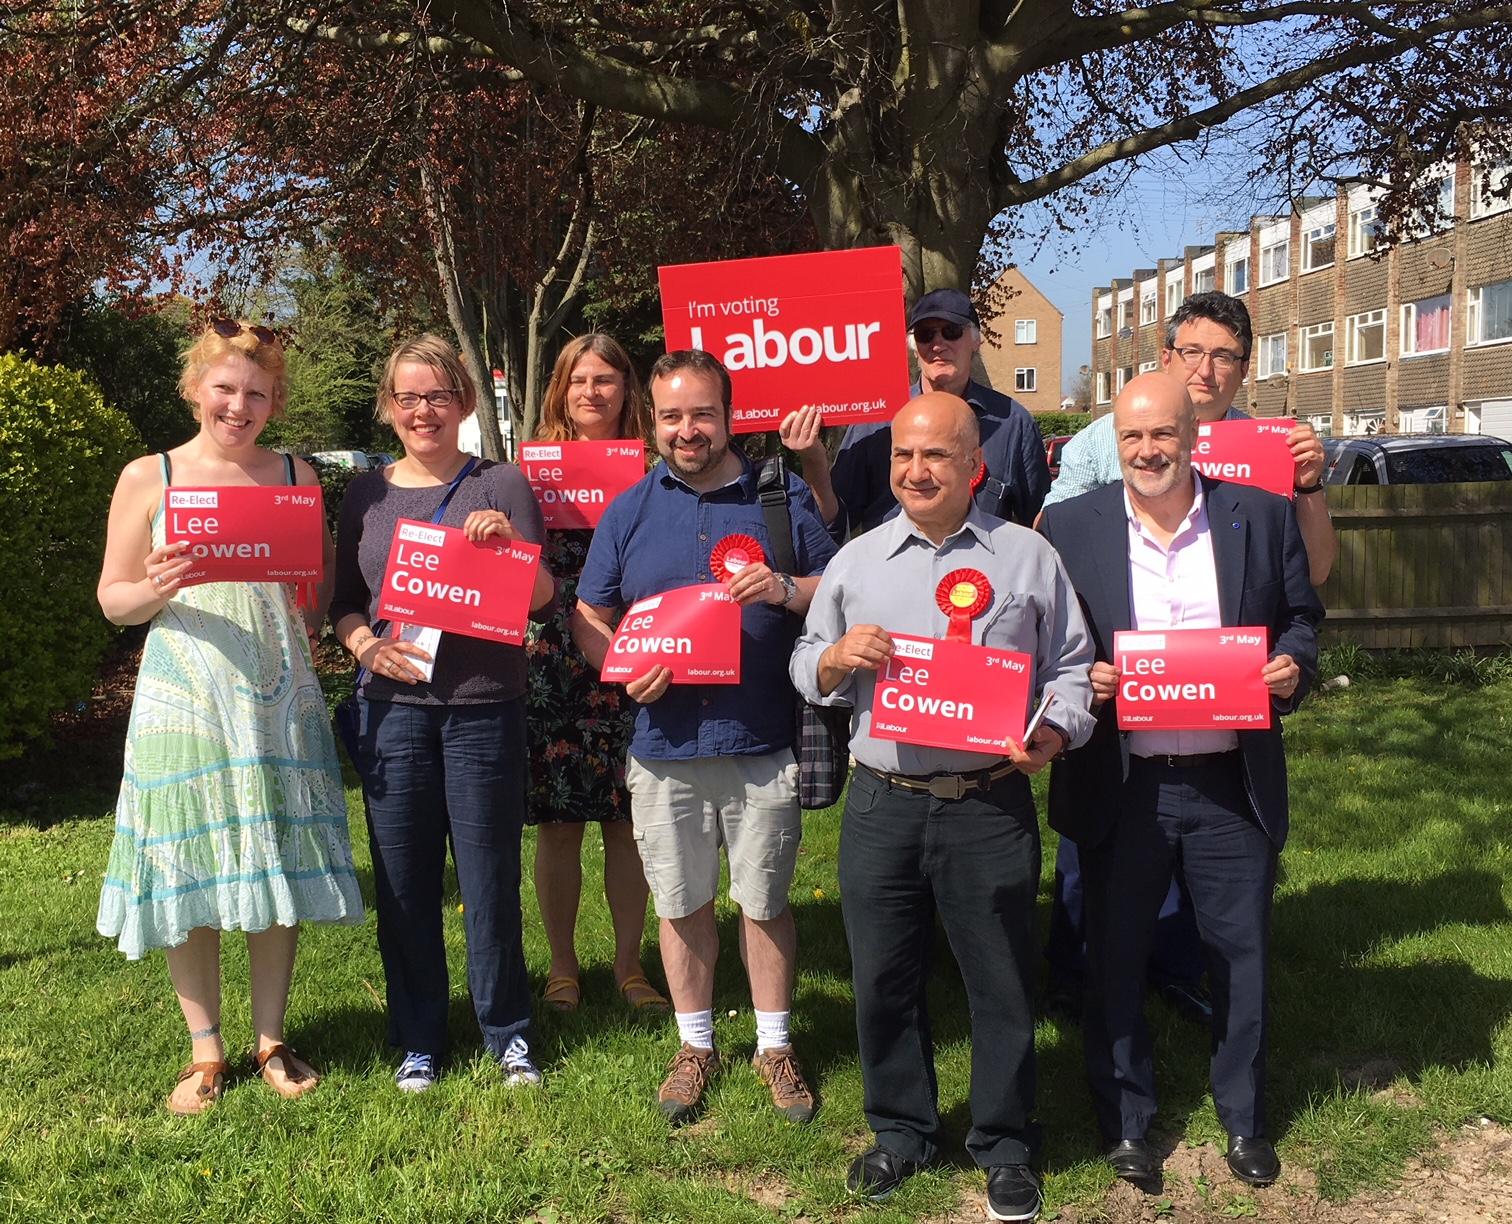 My Local Brexit – Cllr Lee Cowen